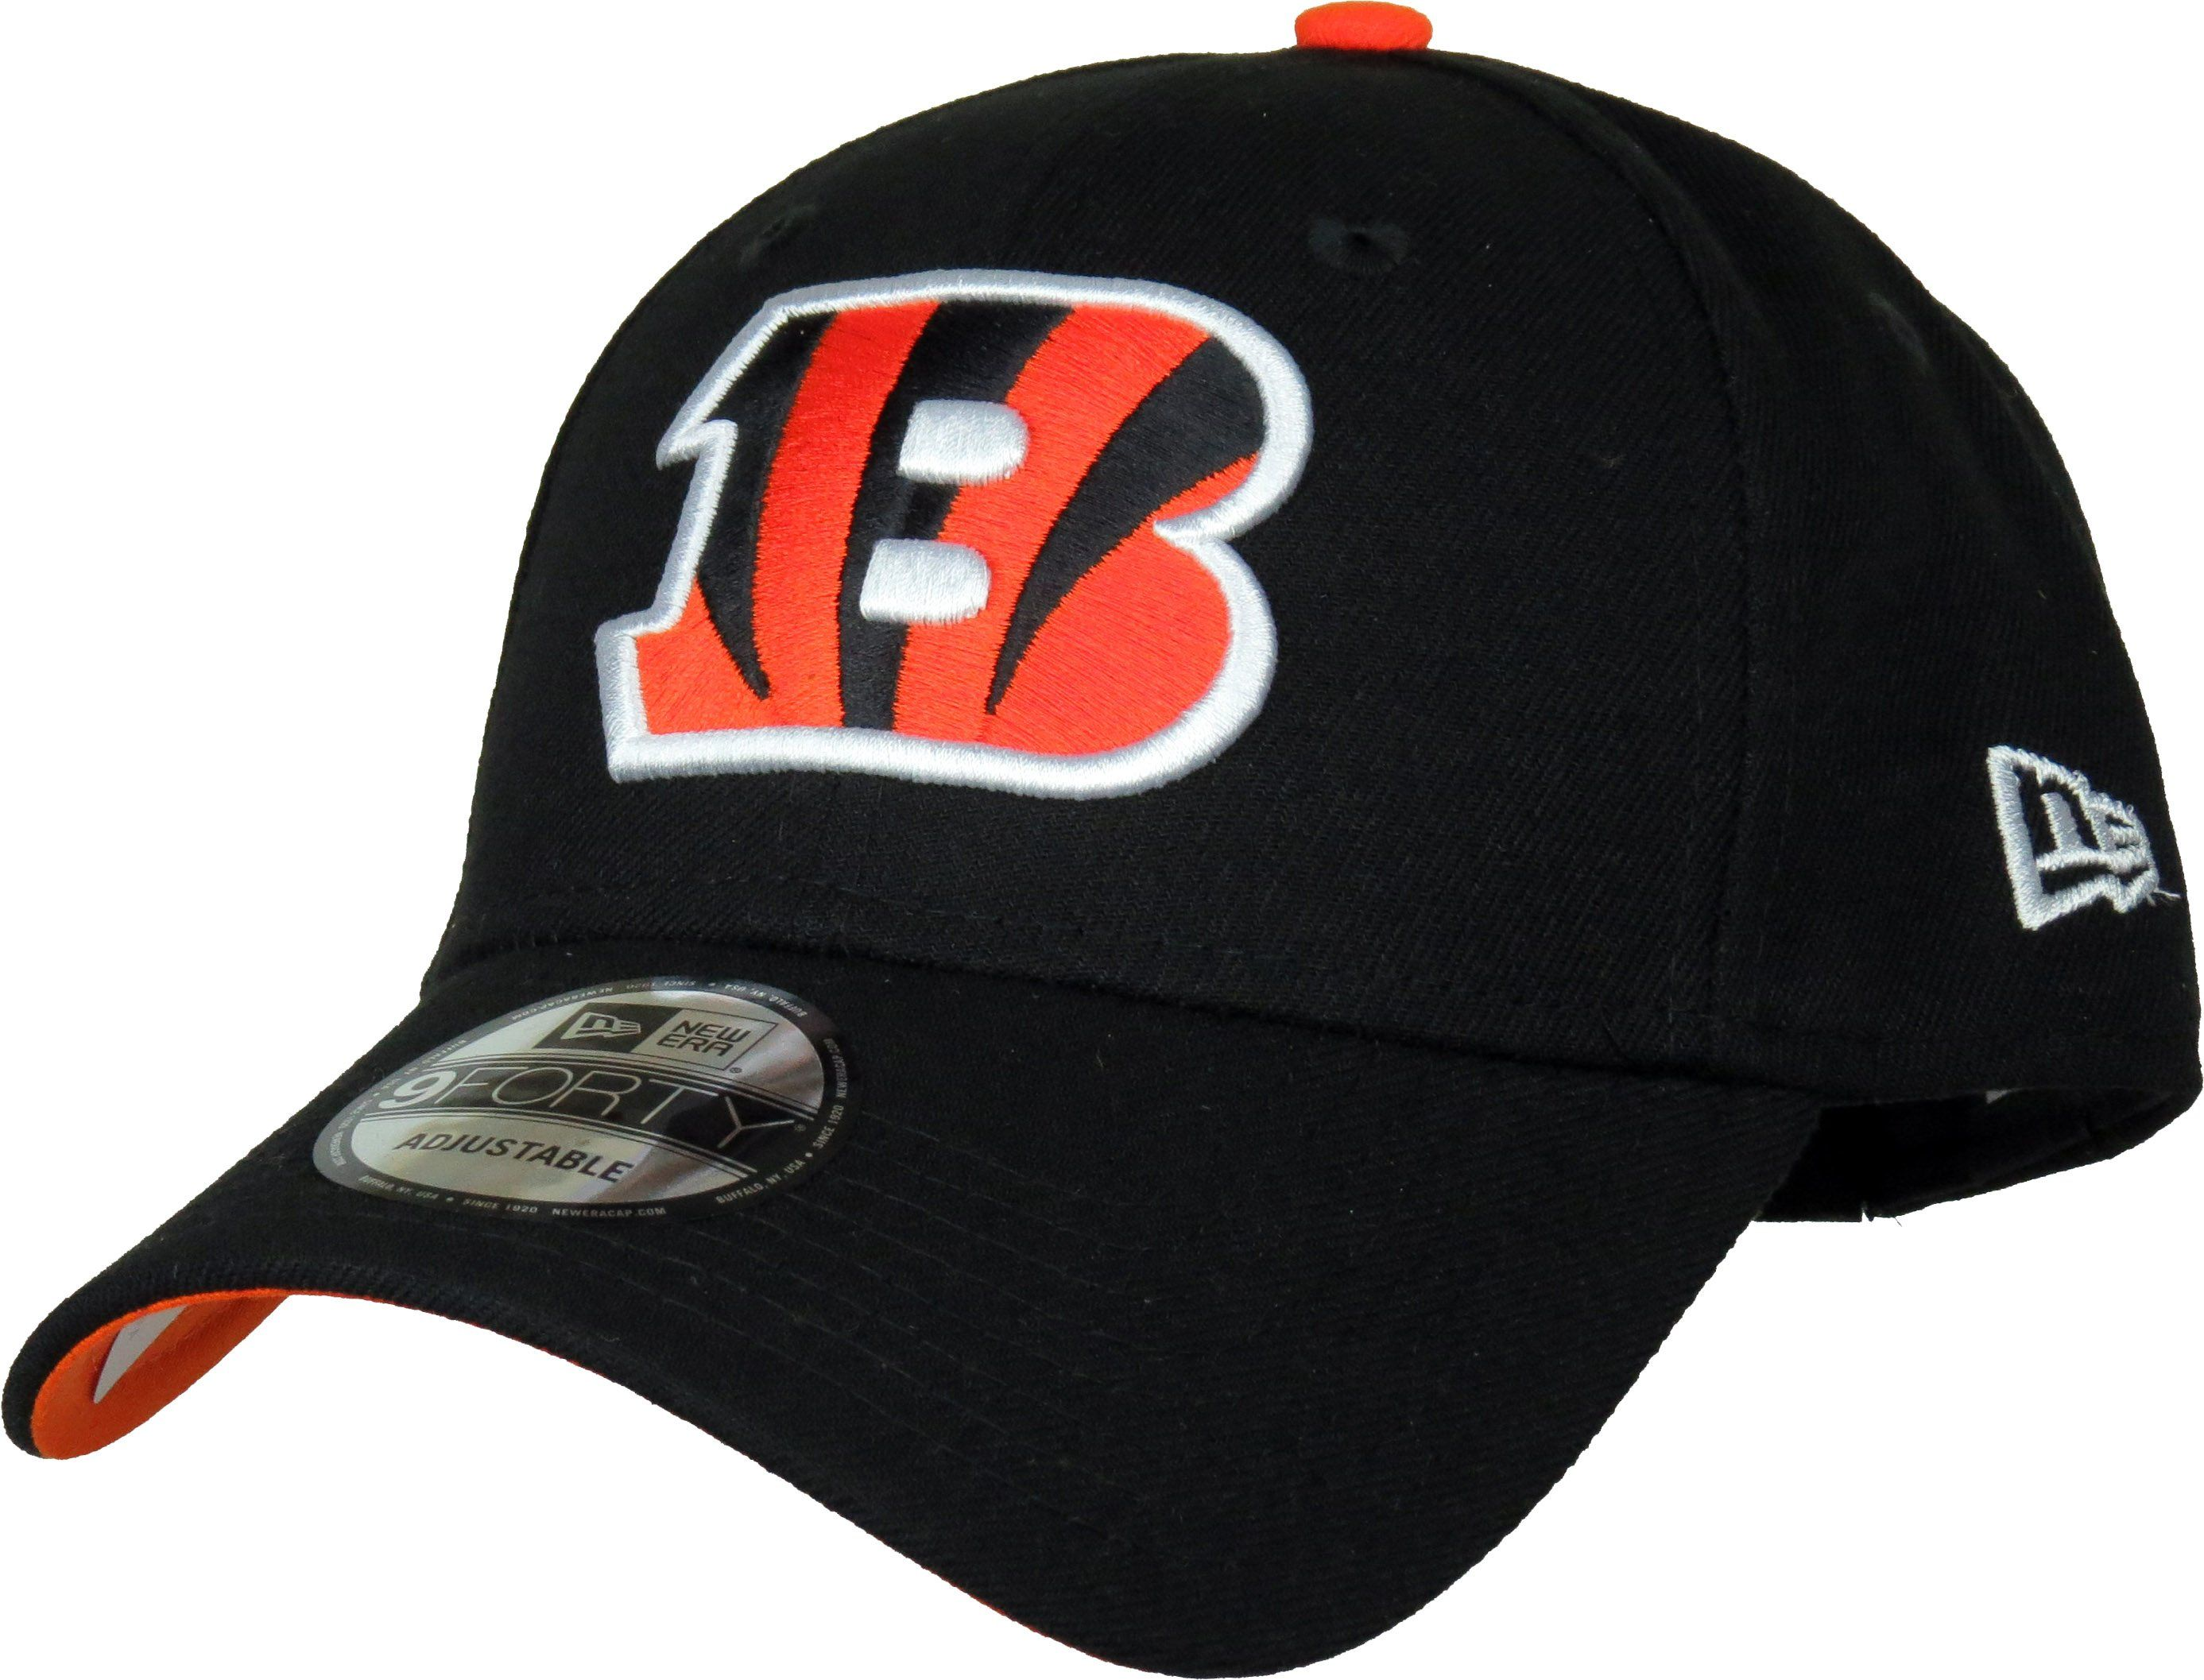 New Era 9Forty NFL The League Adjustable Team Cap. Black with the  Cincinnati Bengals front 8f2463210b9c